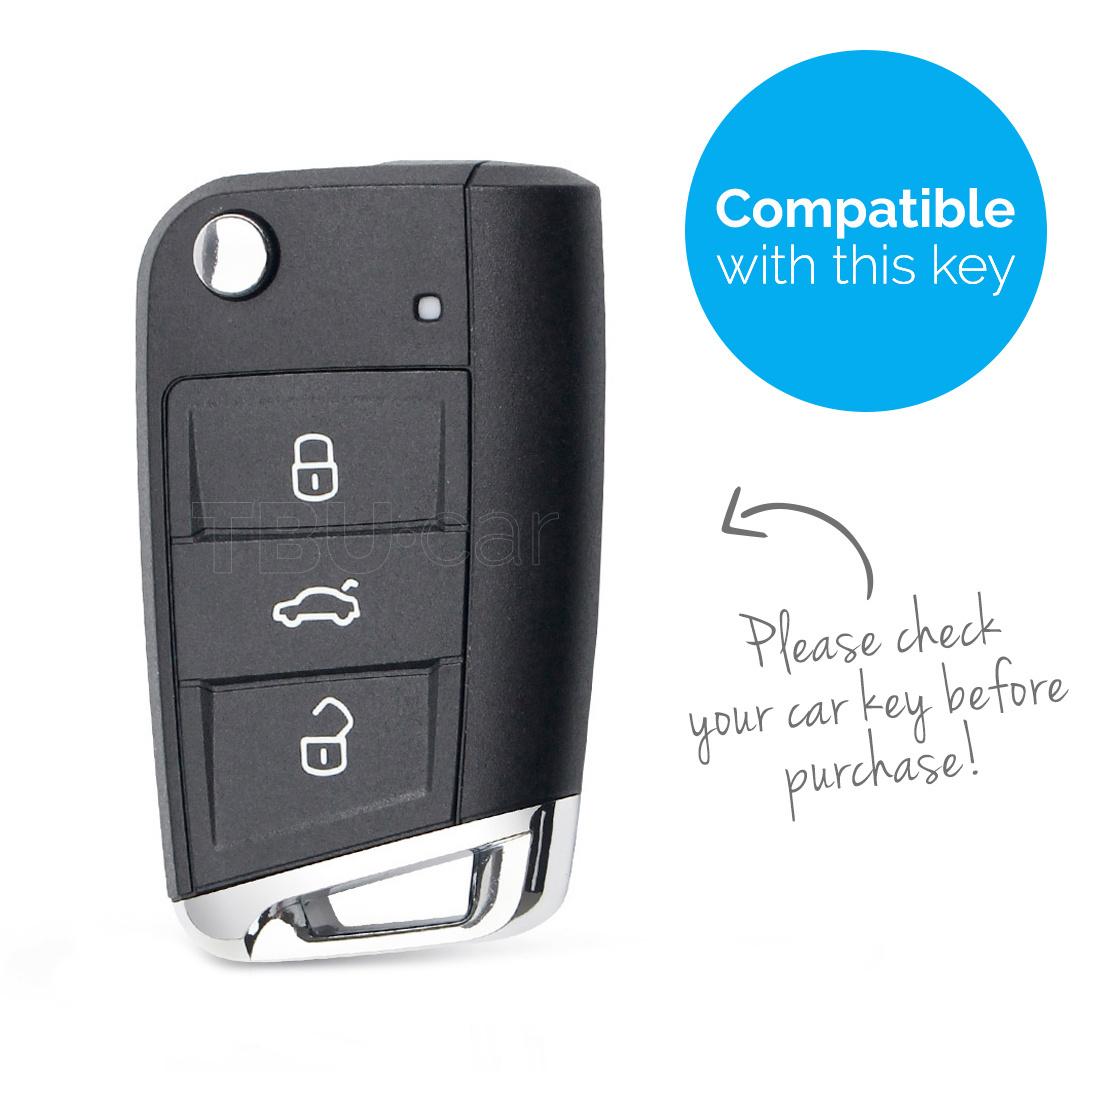 TBU car TBU car Sleutel cover compatibel met Skoda - Silicone sleutelhoesje - beschermhoesje autosleutel - Roze